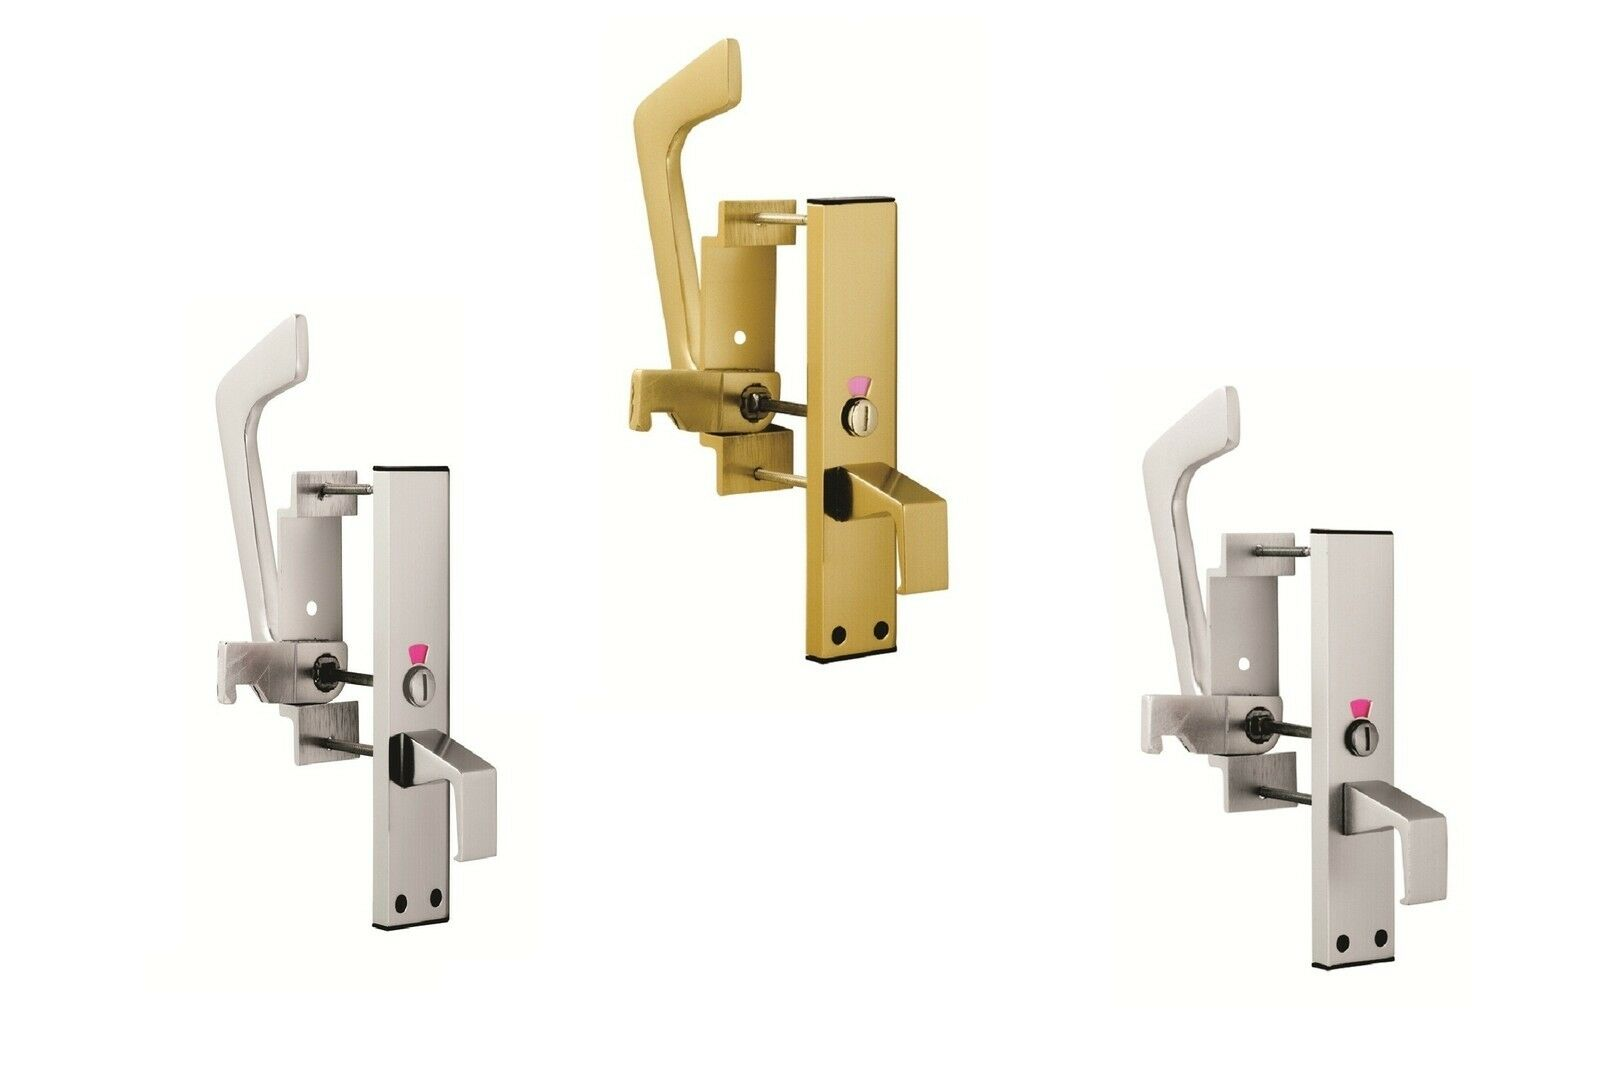 Carlisle Brass - EST9625 - EUROSPEC - Aluminium Disabled Toilet Handle Set